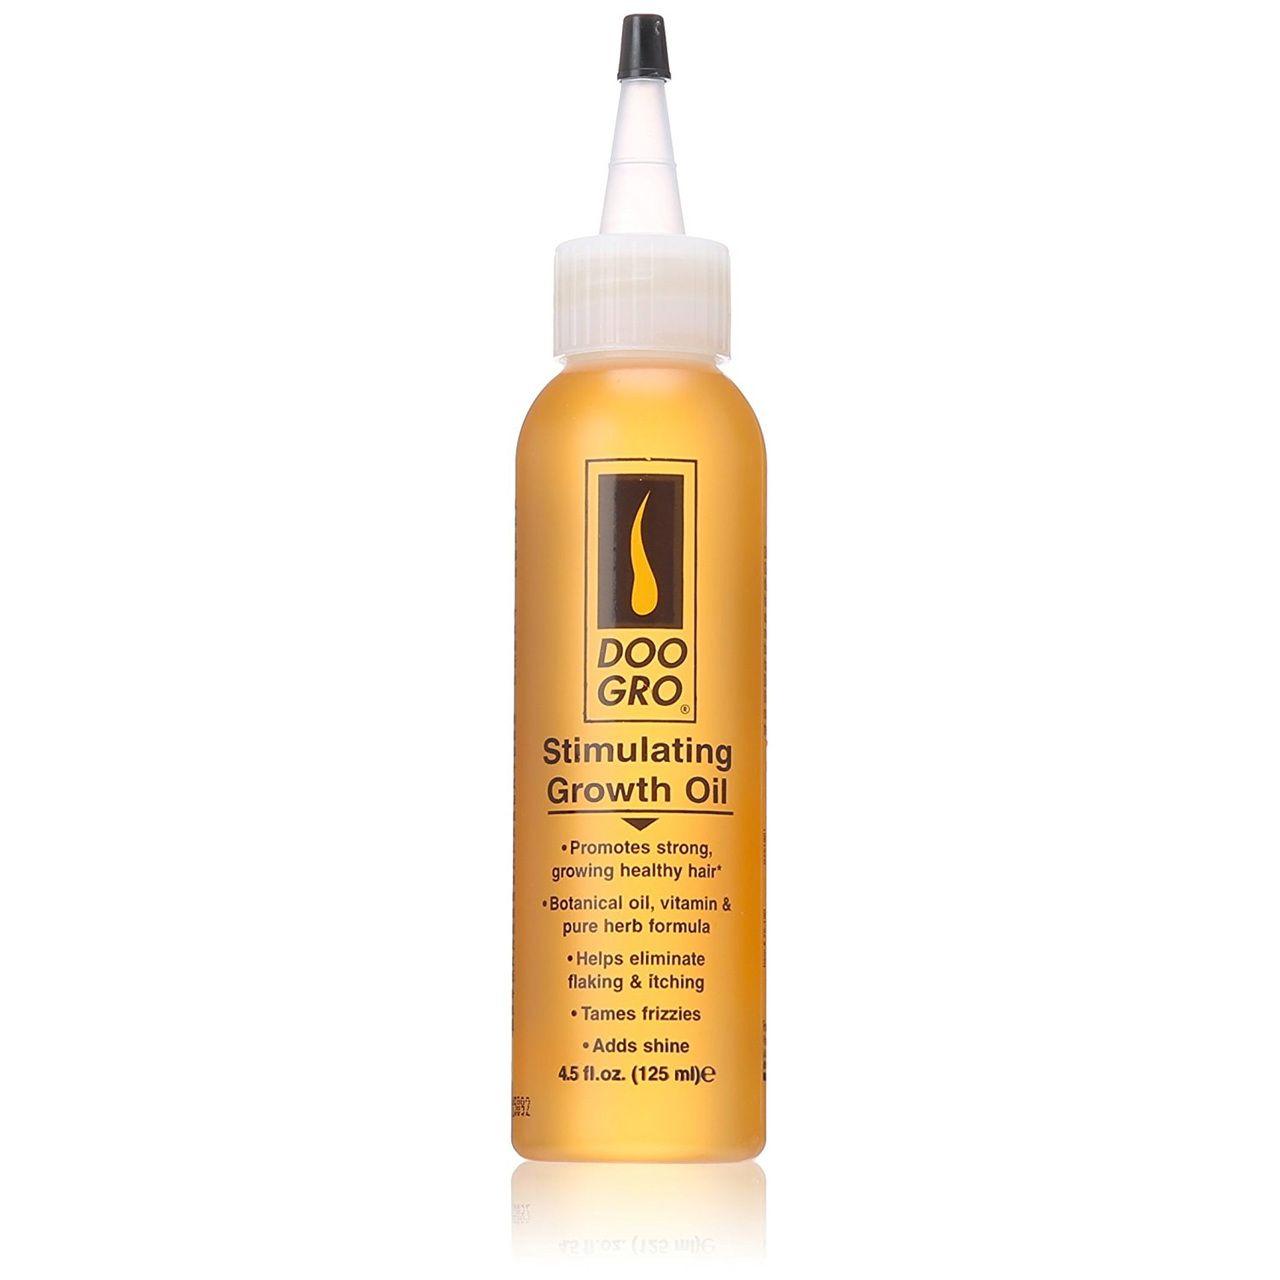 Doo Gro Stimulating Growth Oil - 4.5oz